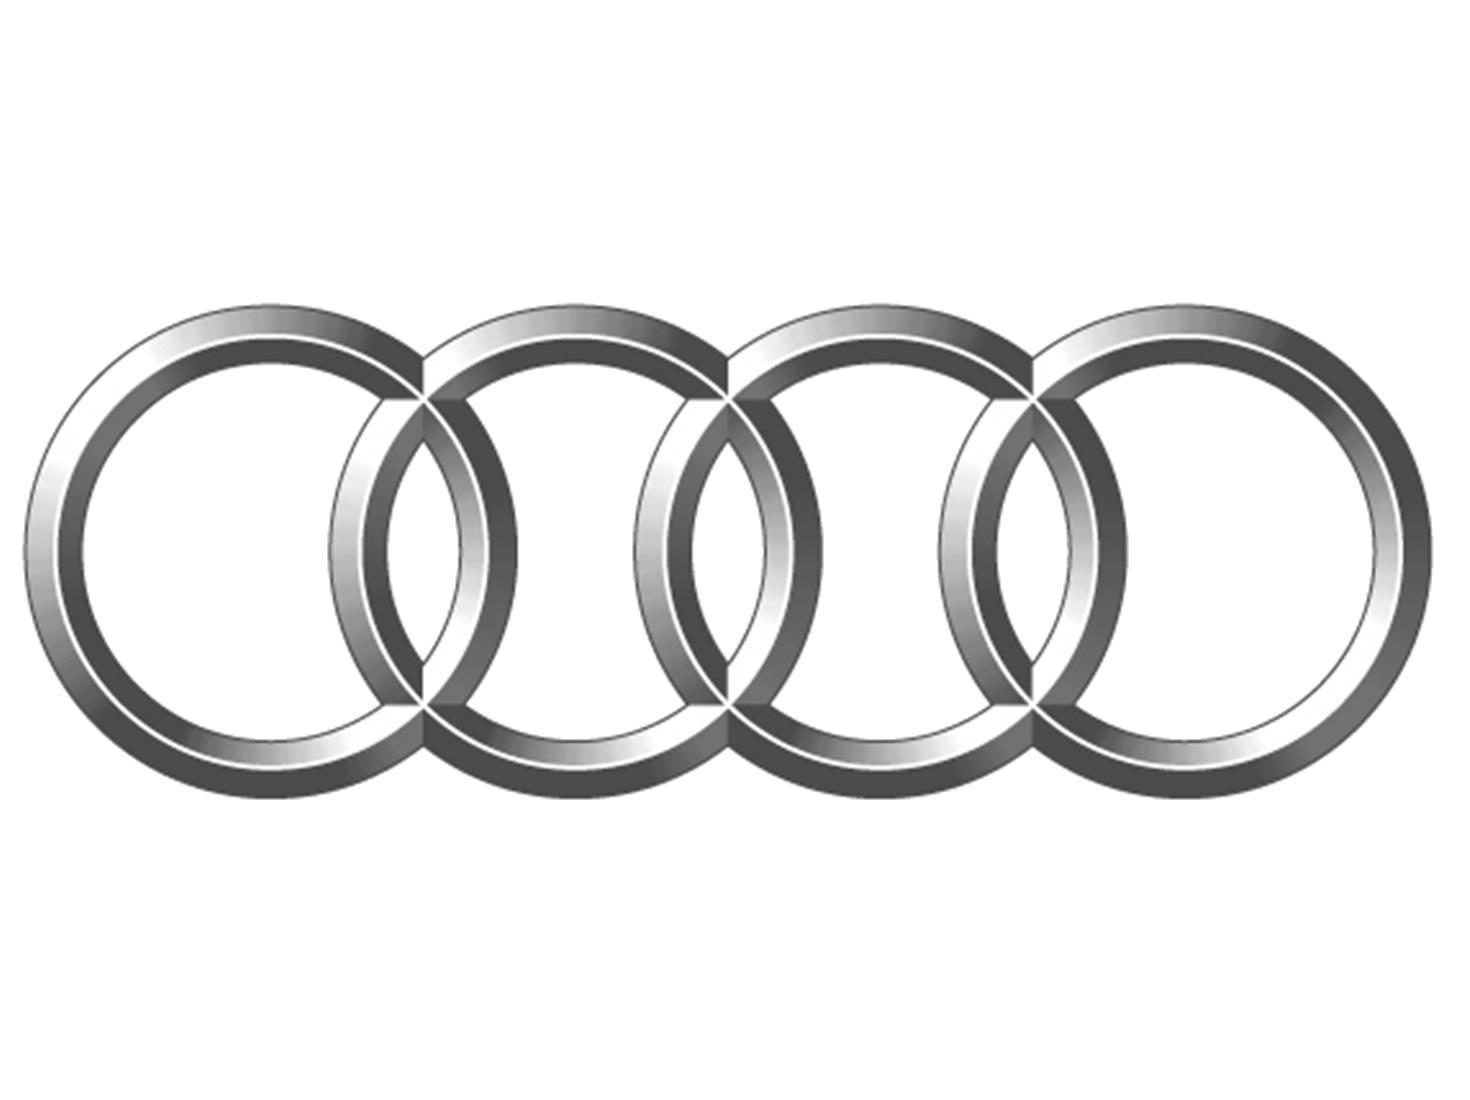 Audi car logo PNG brand image - Audi Logo PNG